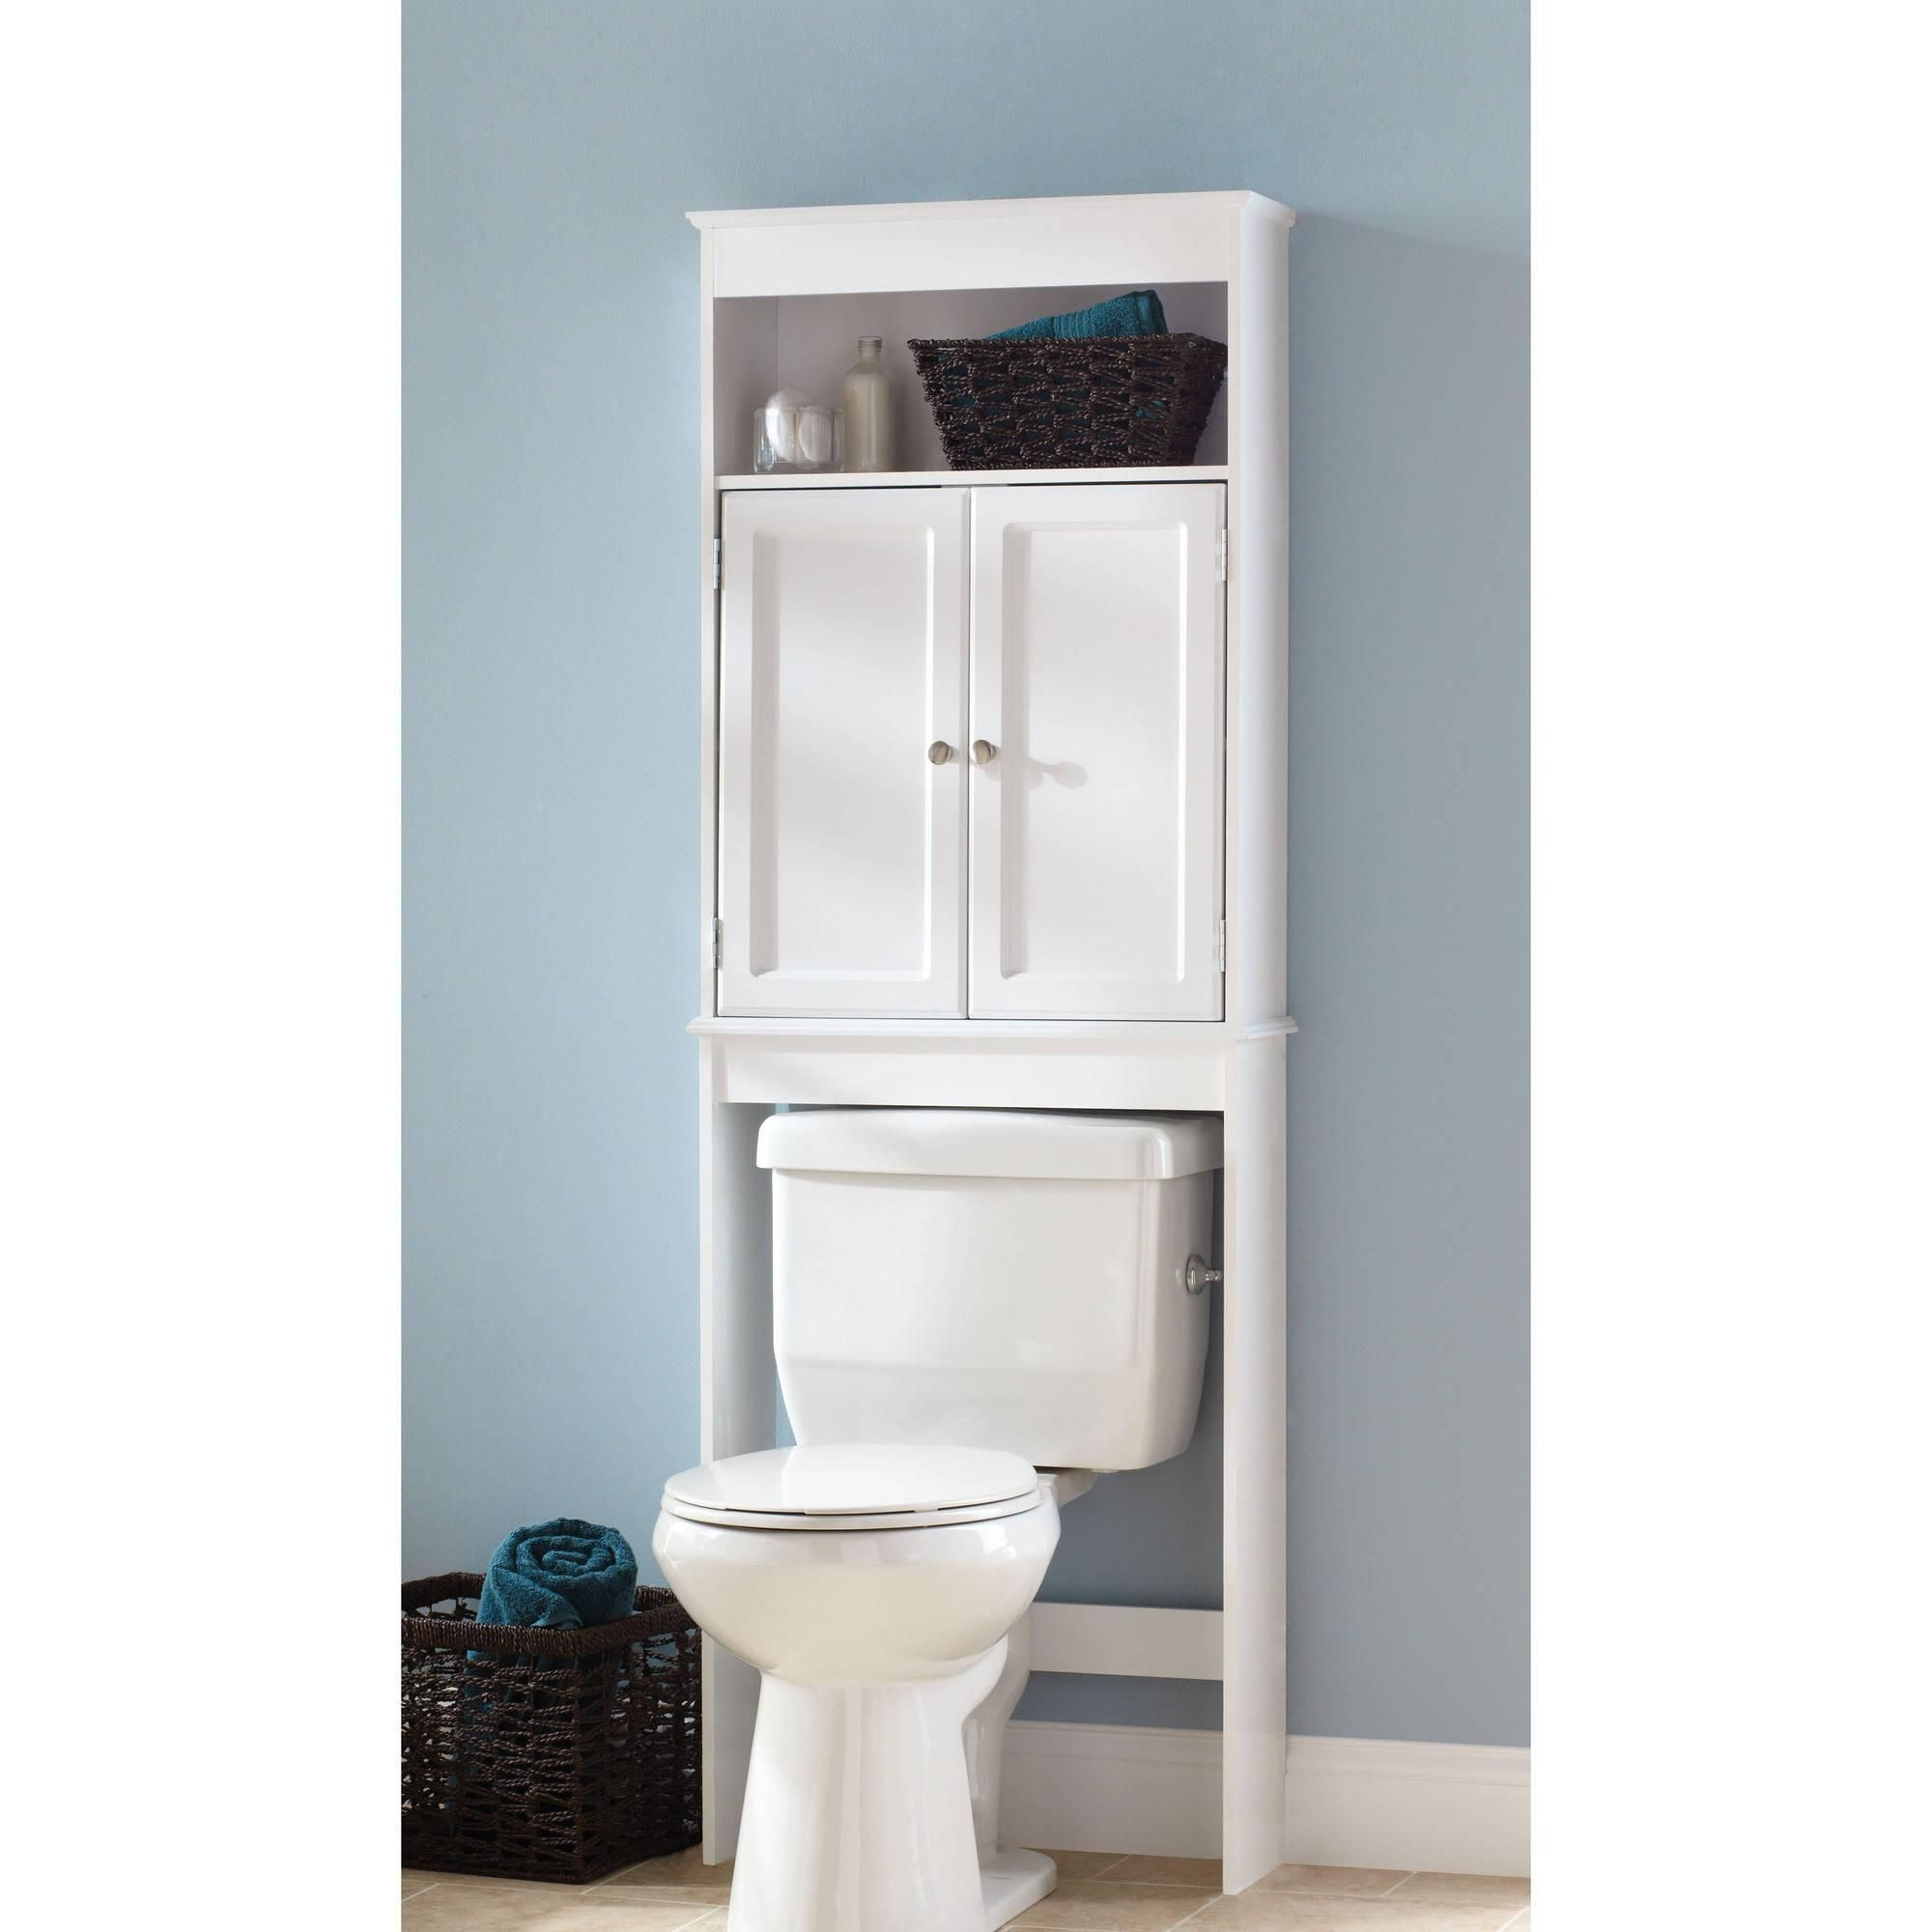 Bathroom shelves over toilet walmart | ideas | Pinterest | Bathroom ...